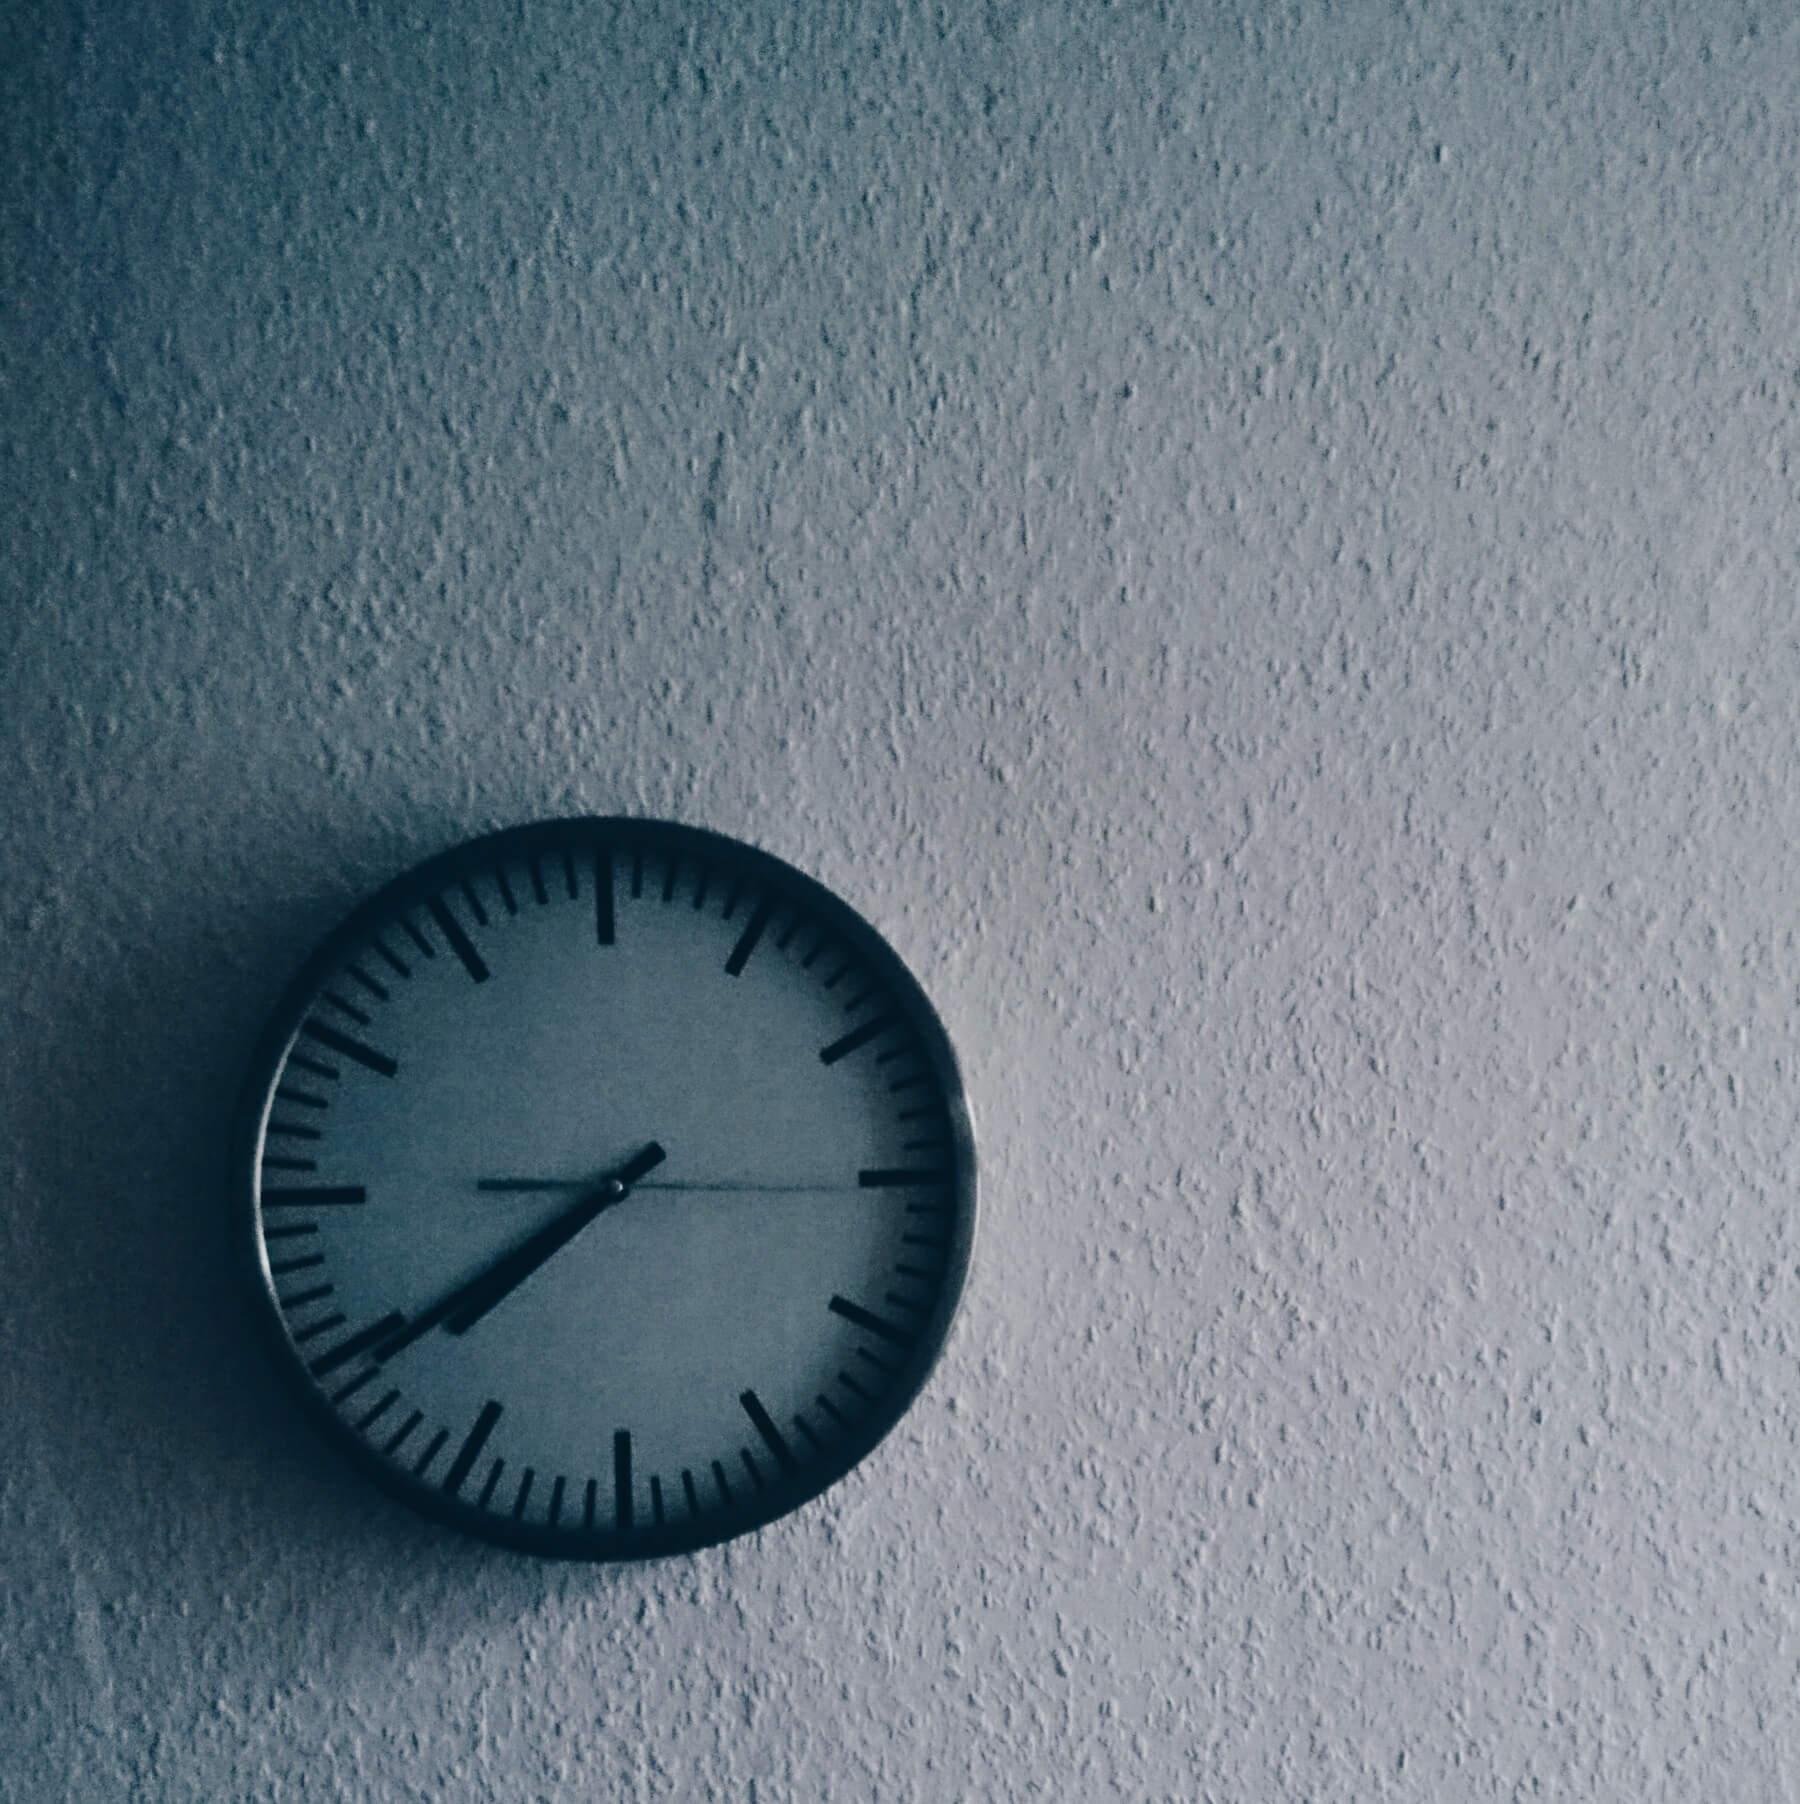 Wanduhr 7:40 Uhr